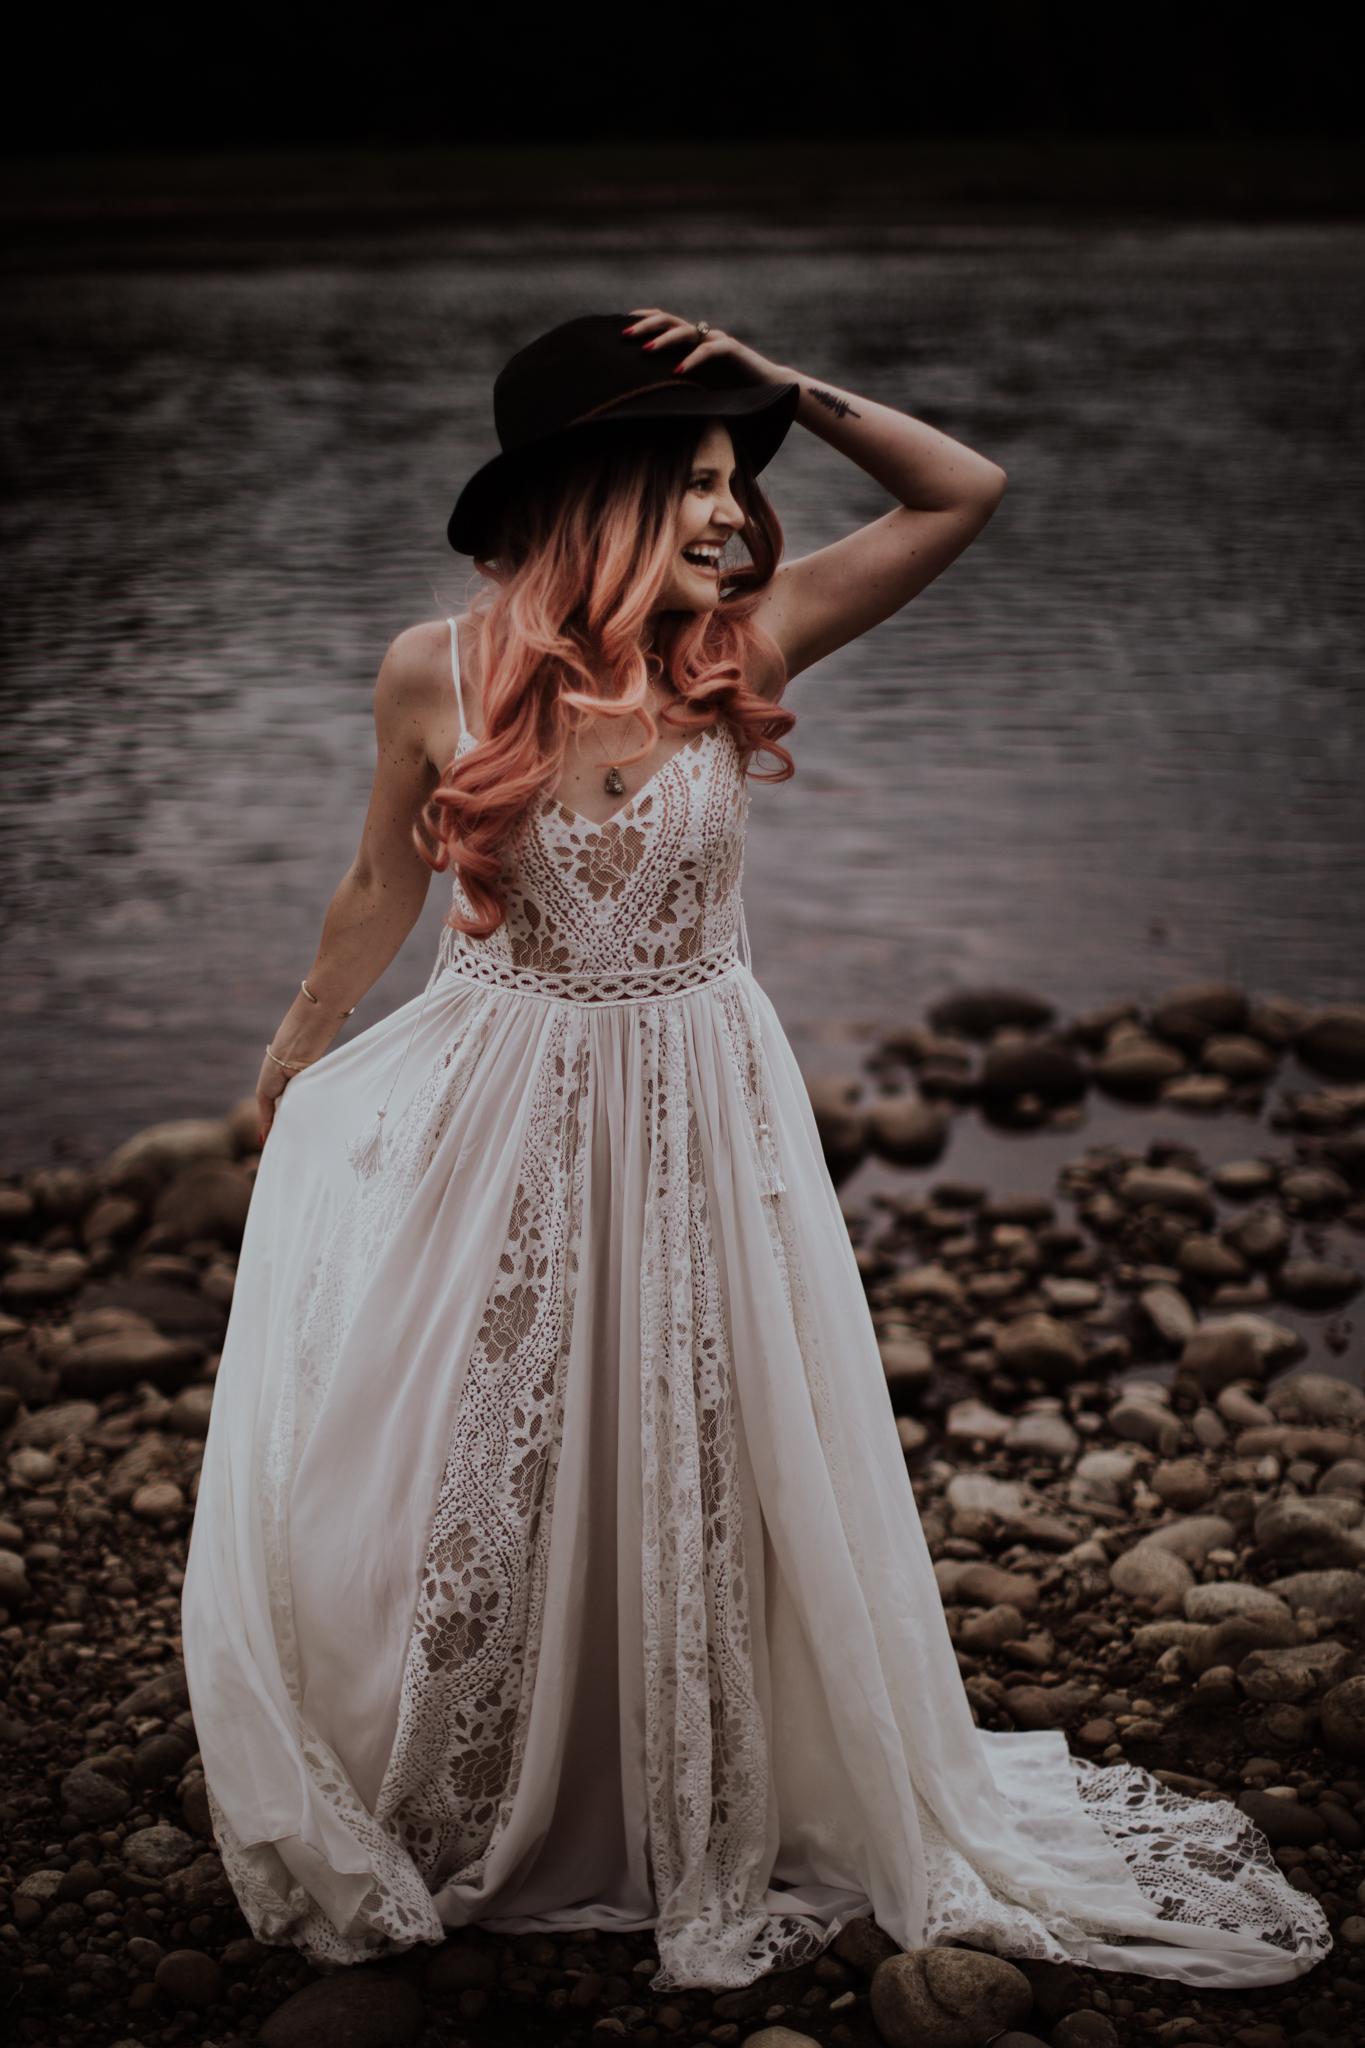 lovelybonesstudio_bridalphotography-5.jpg